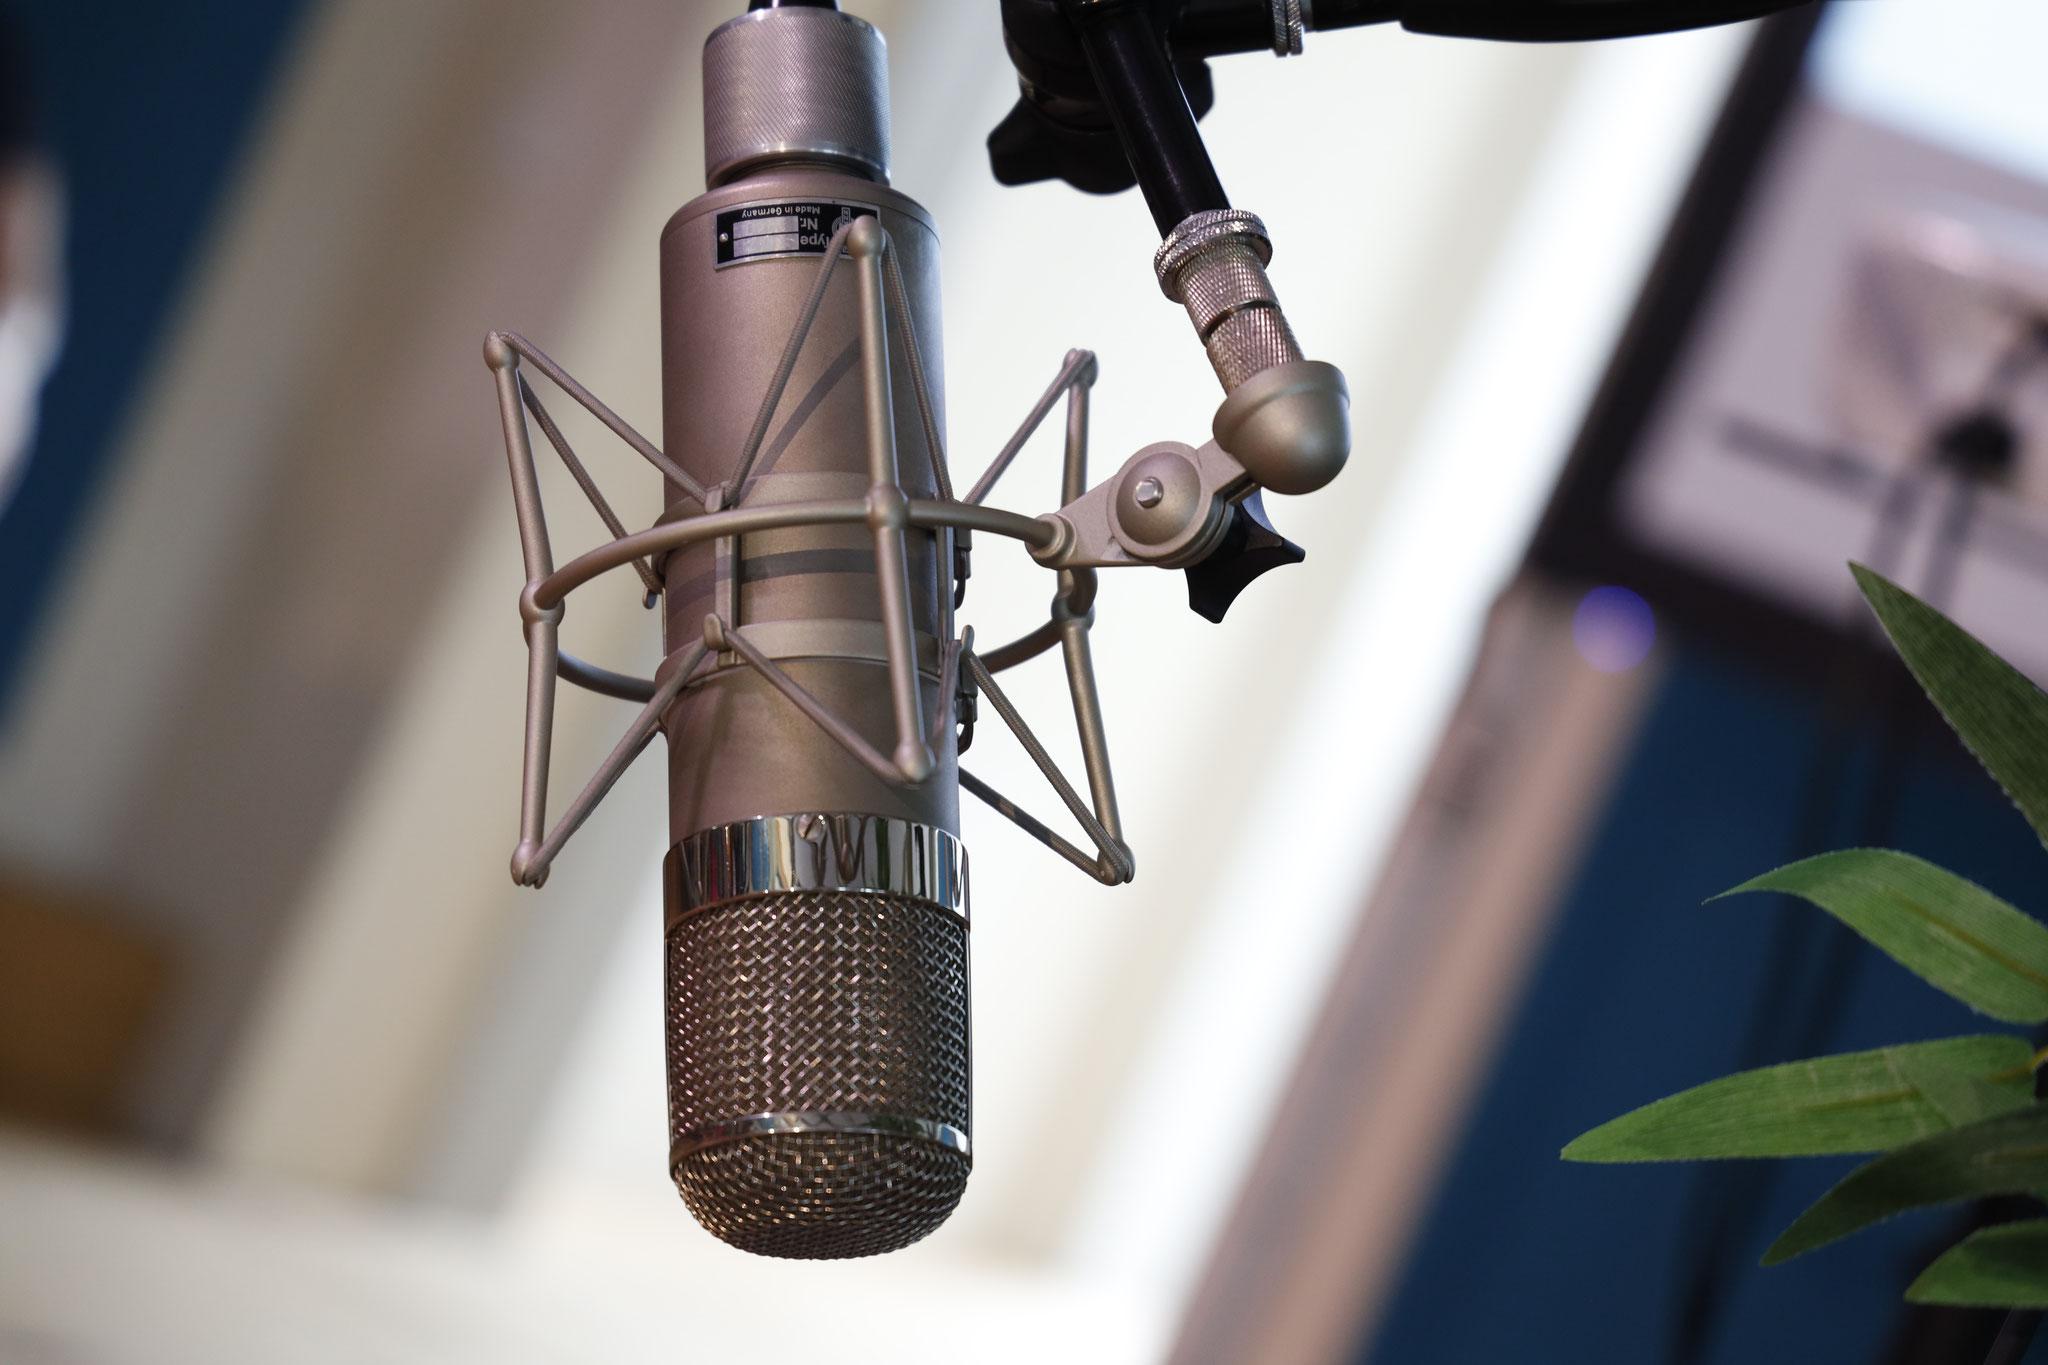 Mikrofon mit sog. Spinne